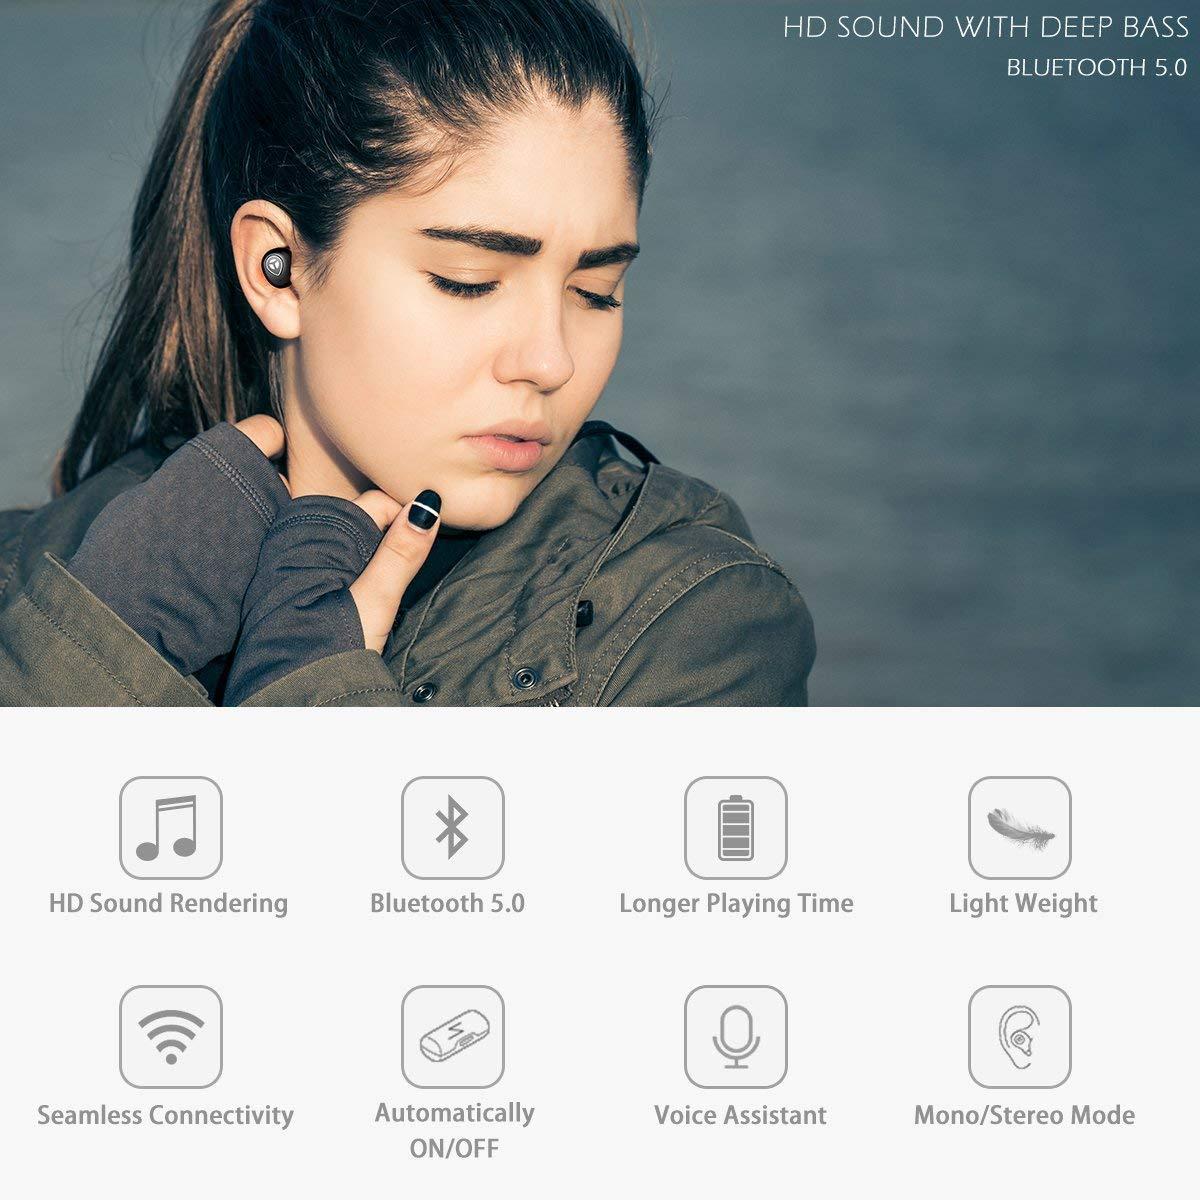 cb2913bbb94 Amazon.com: Bluetooth 5.0 Deep Bass True Wireless Headphones, Junwer Sports  Wireless Earbuds, Sweat Proof Earphones Built-in Microphone for Running, ...